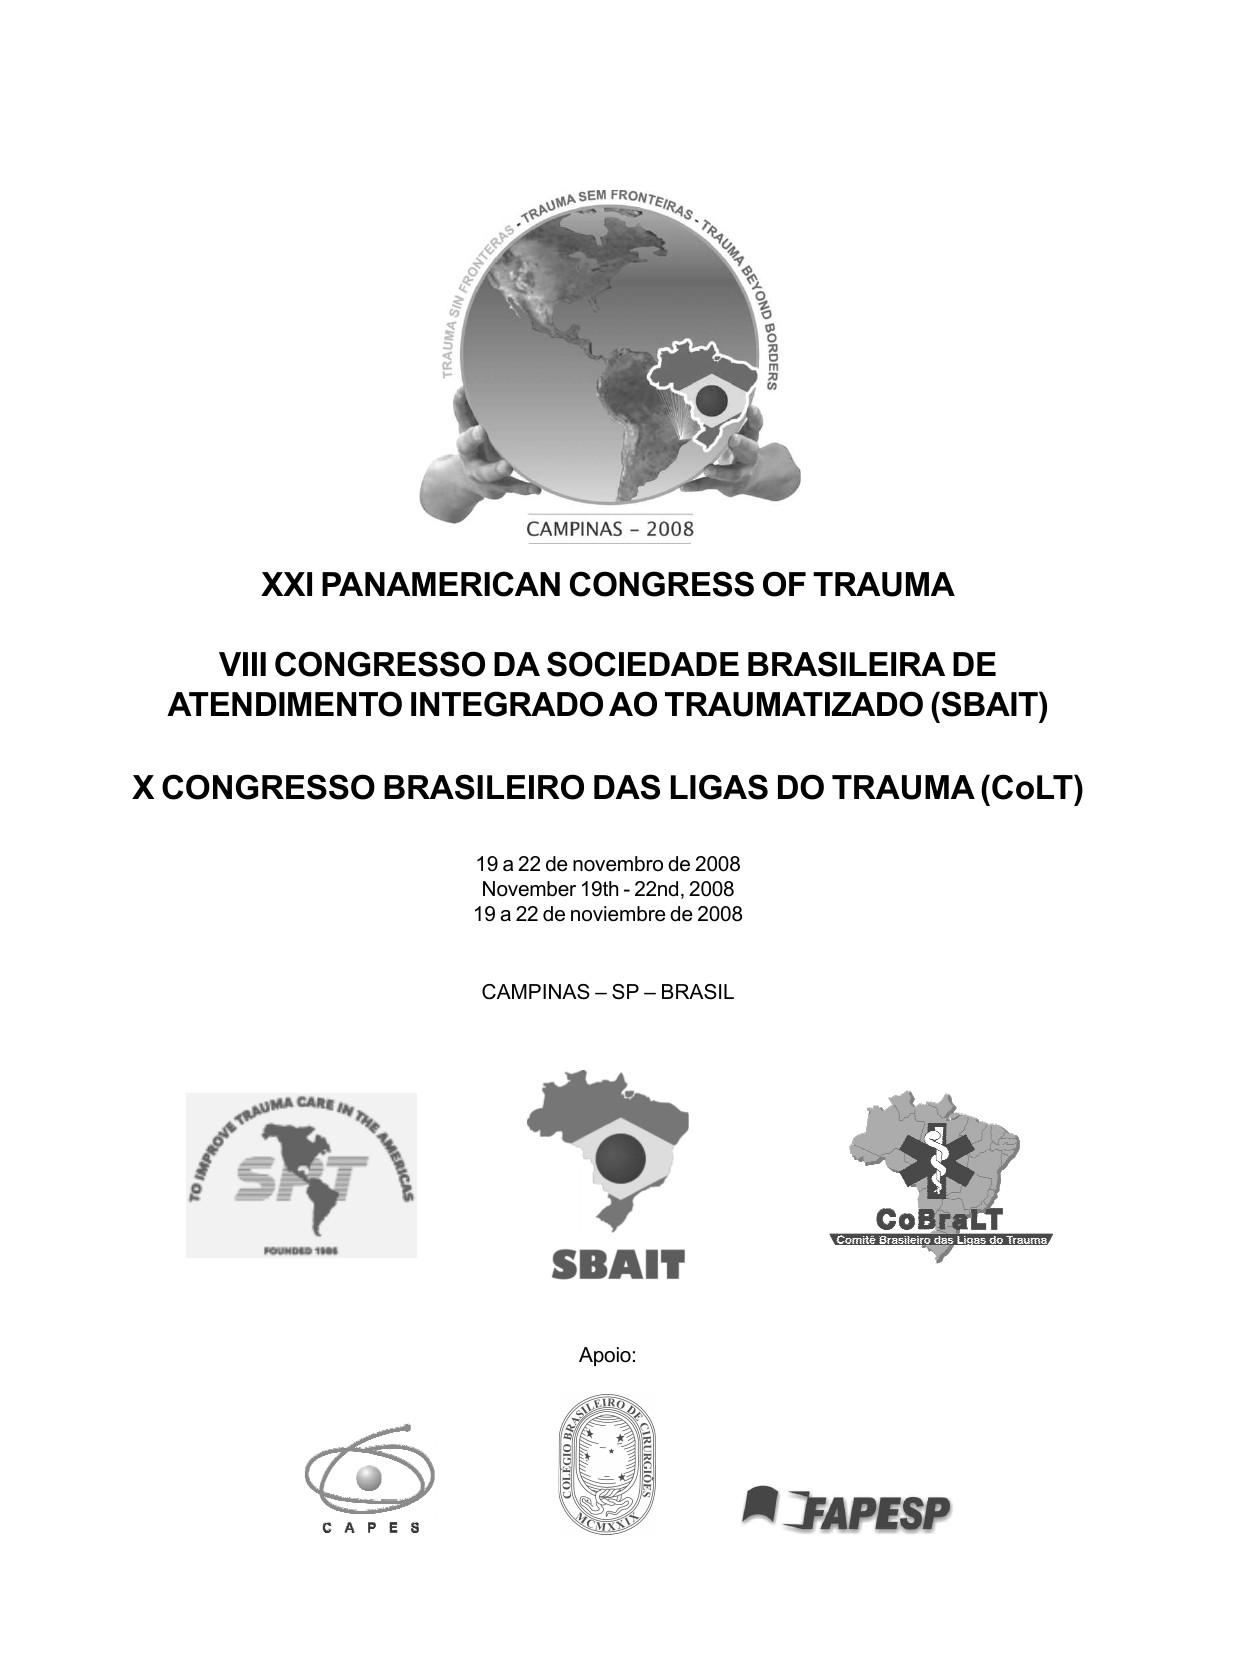 Calendario 2020 Feriados Rs Más Recientes Xxi Panamerican Congress Of Trauma Viii Congresso Da Of Calendario 2020 Feriados Rs Más Arriba-a-fecha Notcias Principais ifrs Campus Porto Alegre